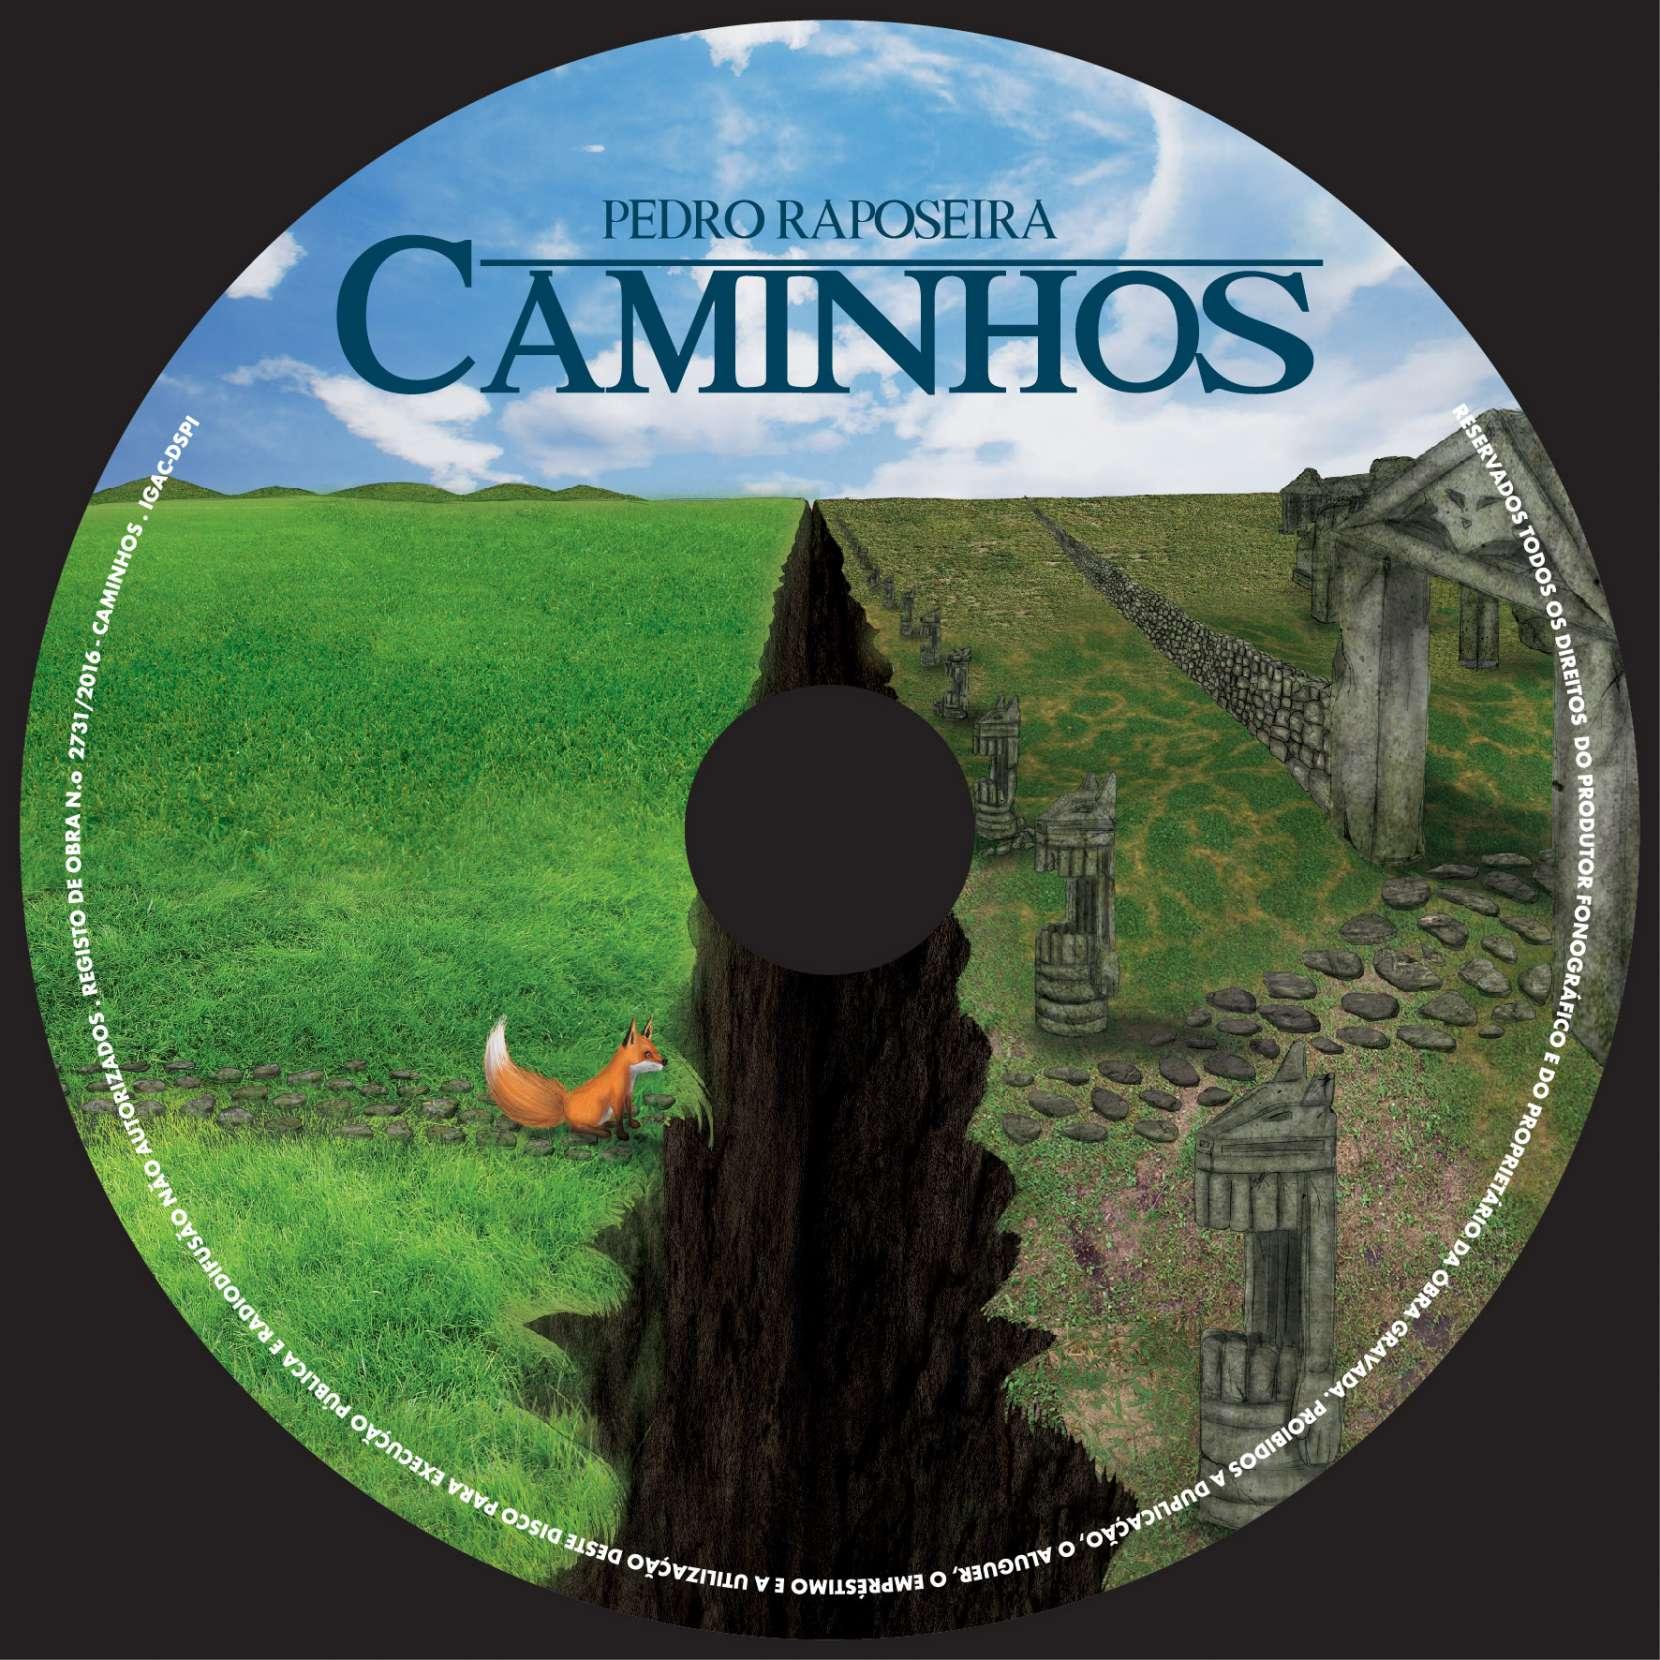 Caminhos_bolacha_cd_full_curvas-01.jpg